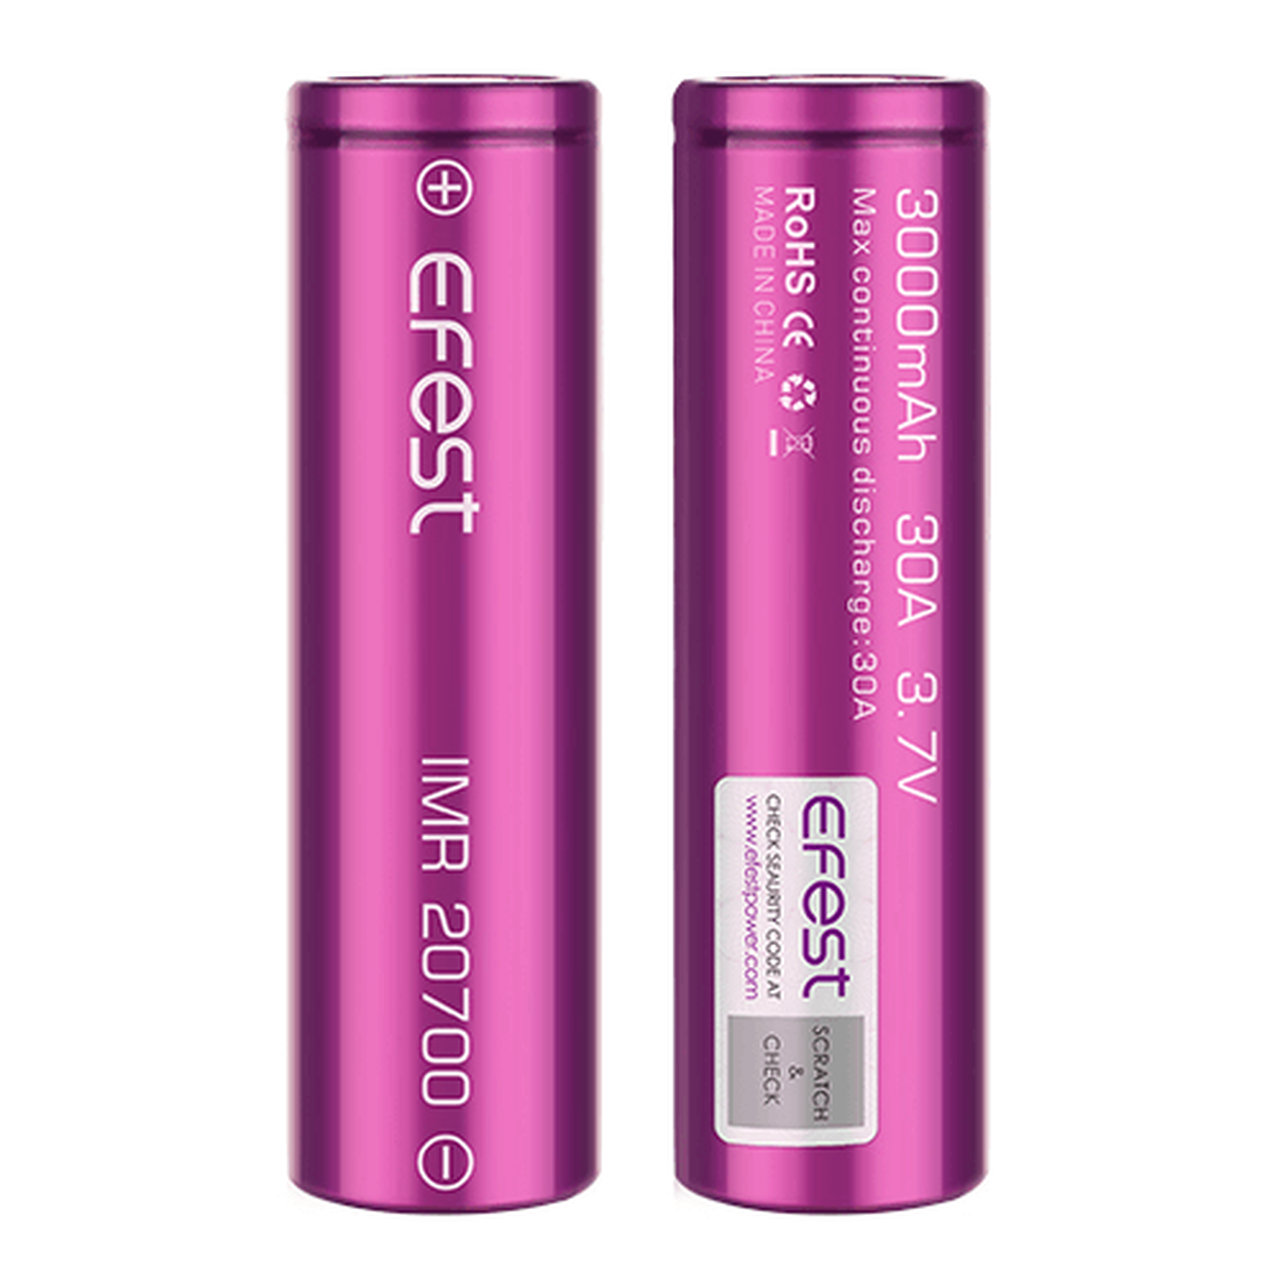 Efest IMR Battery - Mooch-Approved